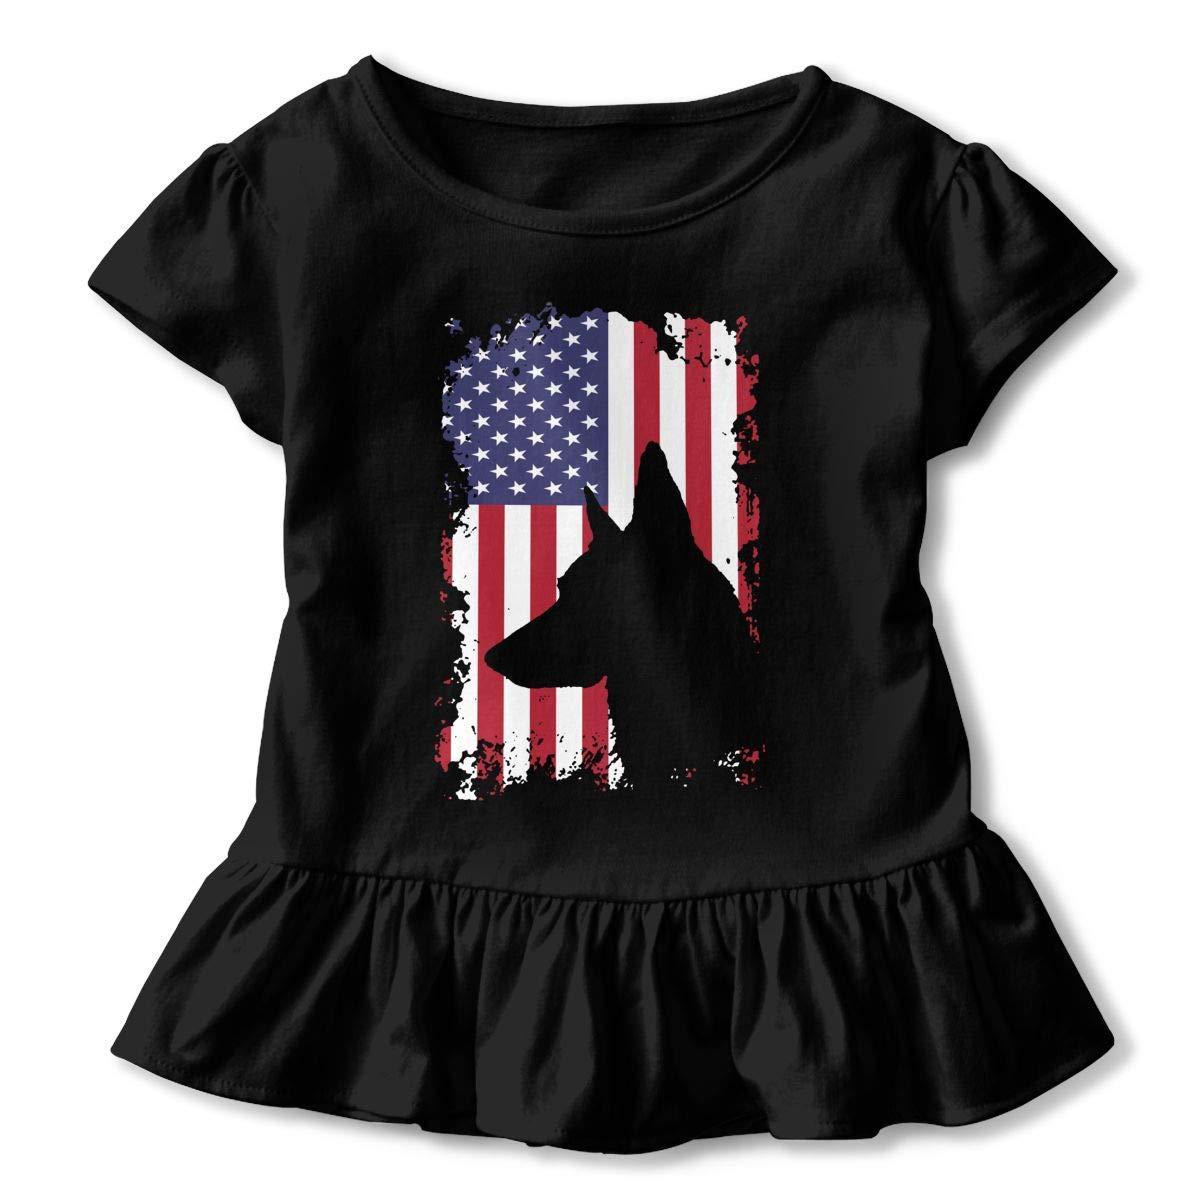 SHIRT1-KIDS German Shepherd American Flag Childrens Girls Short Sleeve Ruffles Shirt Tee for 2-6 Toddlers